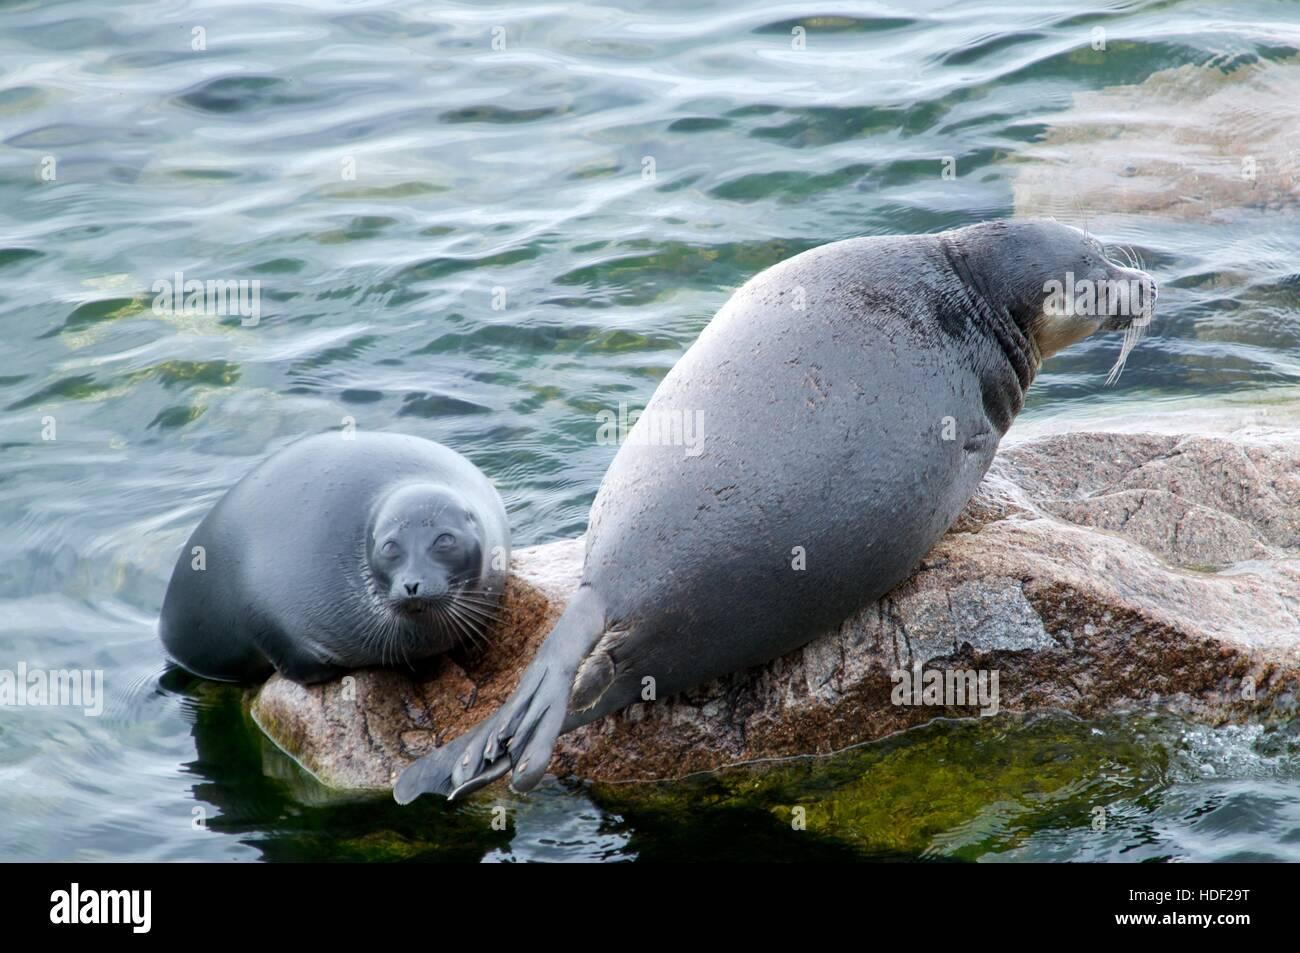 The Baikal seal nerpa - Stock Image